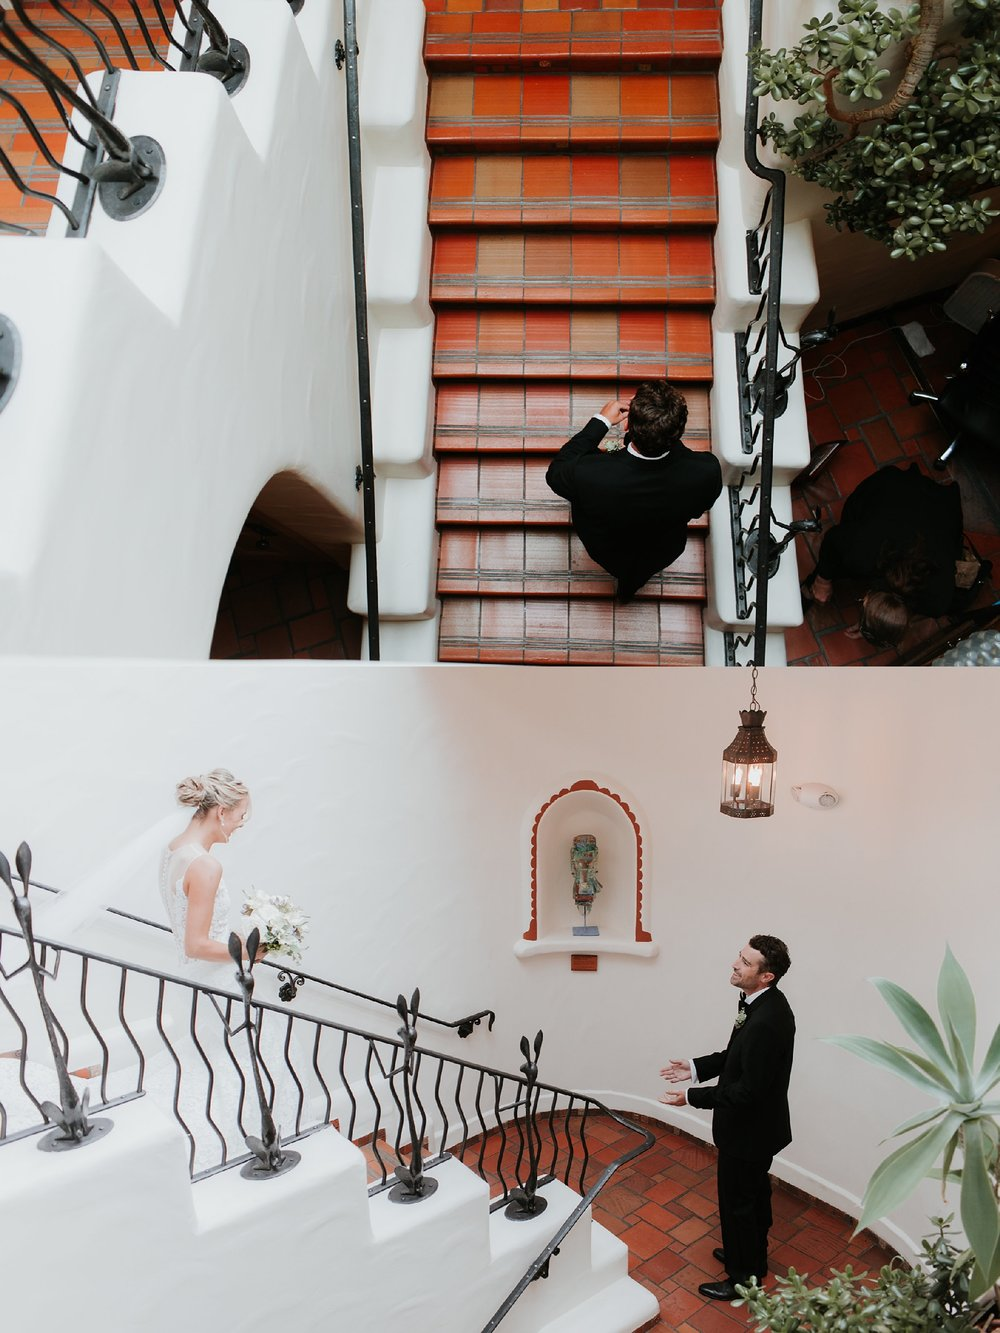 Alicia+lucia+photography+-+albuquerque+wedding+photographer+-+santa+fe+wedding+photography+-+new+mexico+wedding+photographer+-+new+mexico+wedding+-+engagement+-+santa+fe+wedding+-+la+fonda+on+the+plaza+-+la+fonda+wedding_0028.jpg